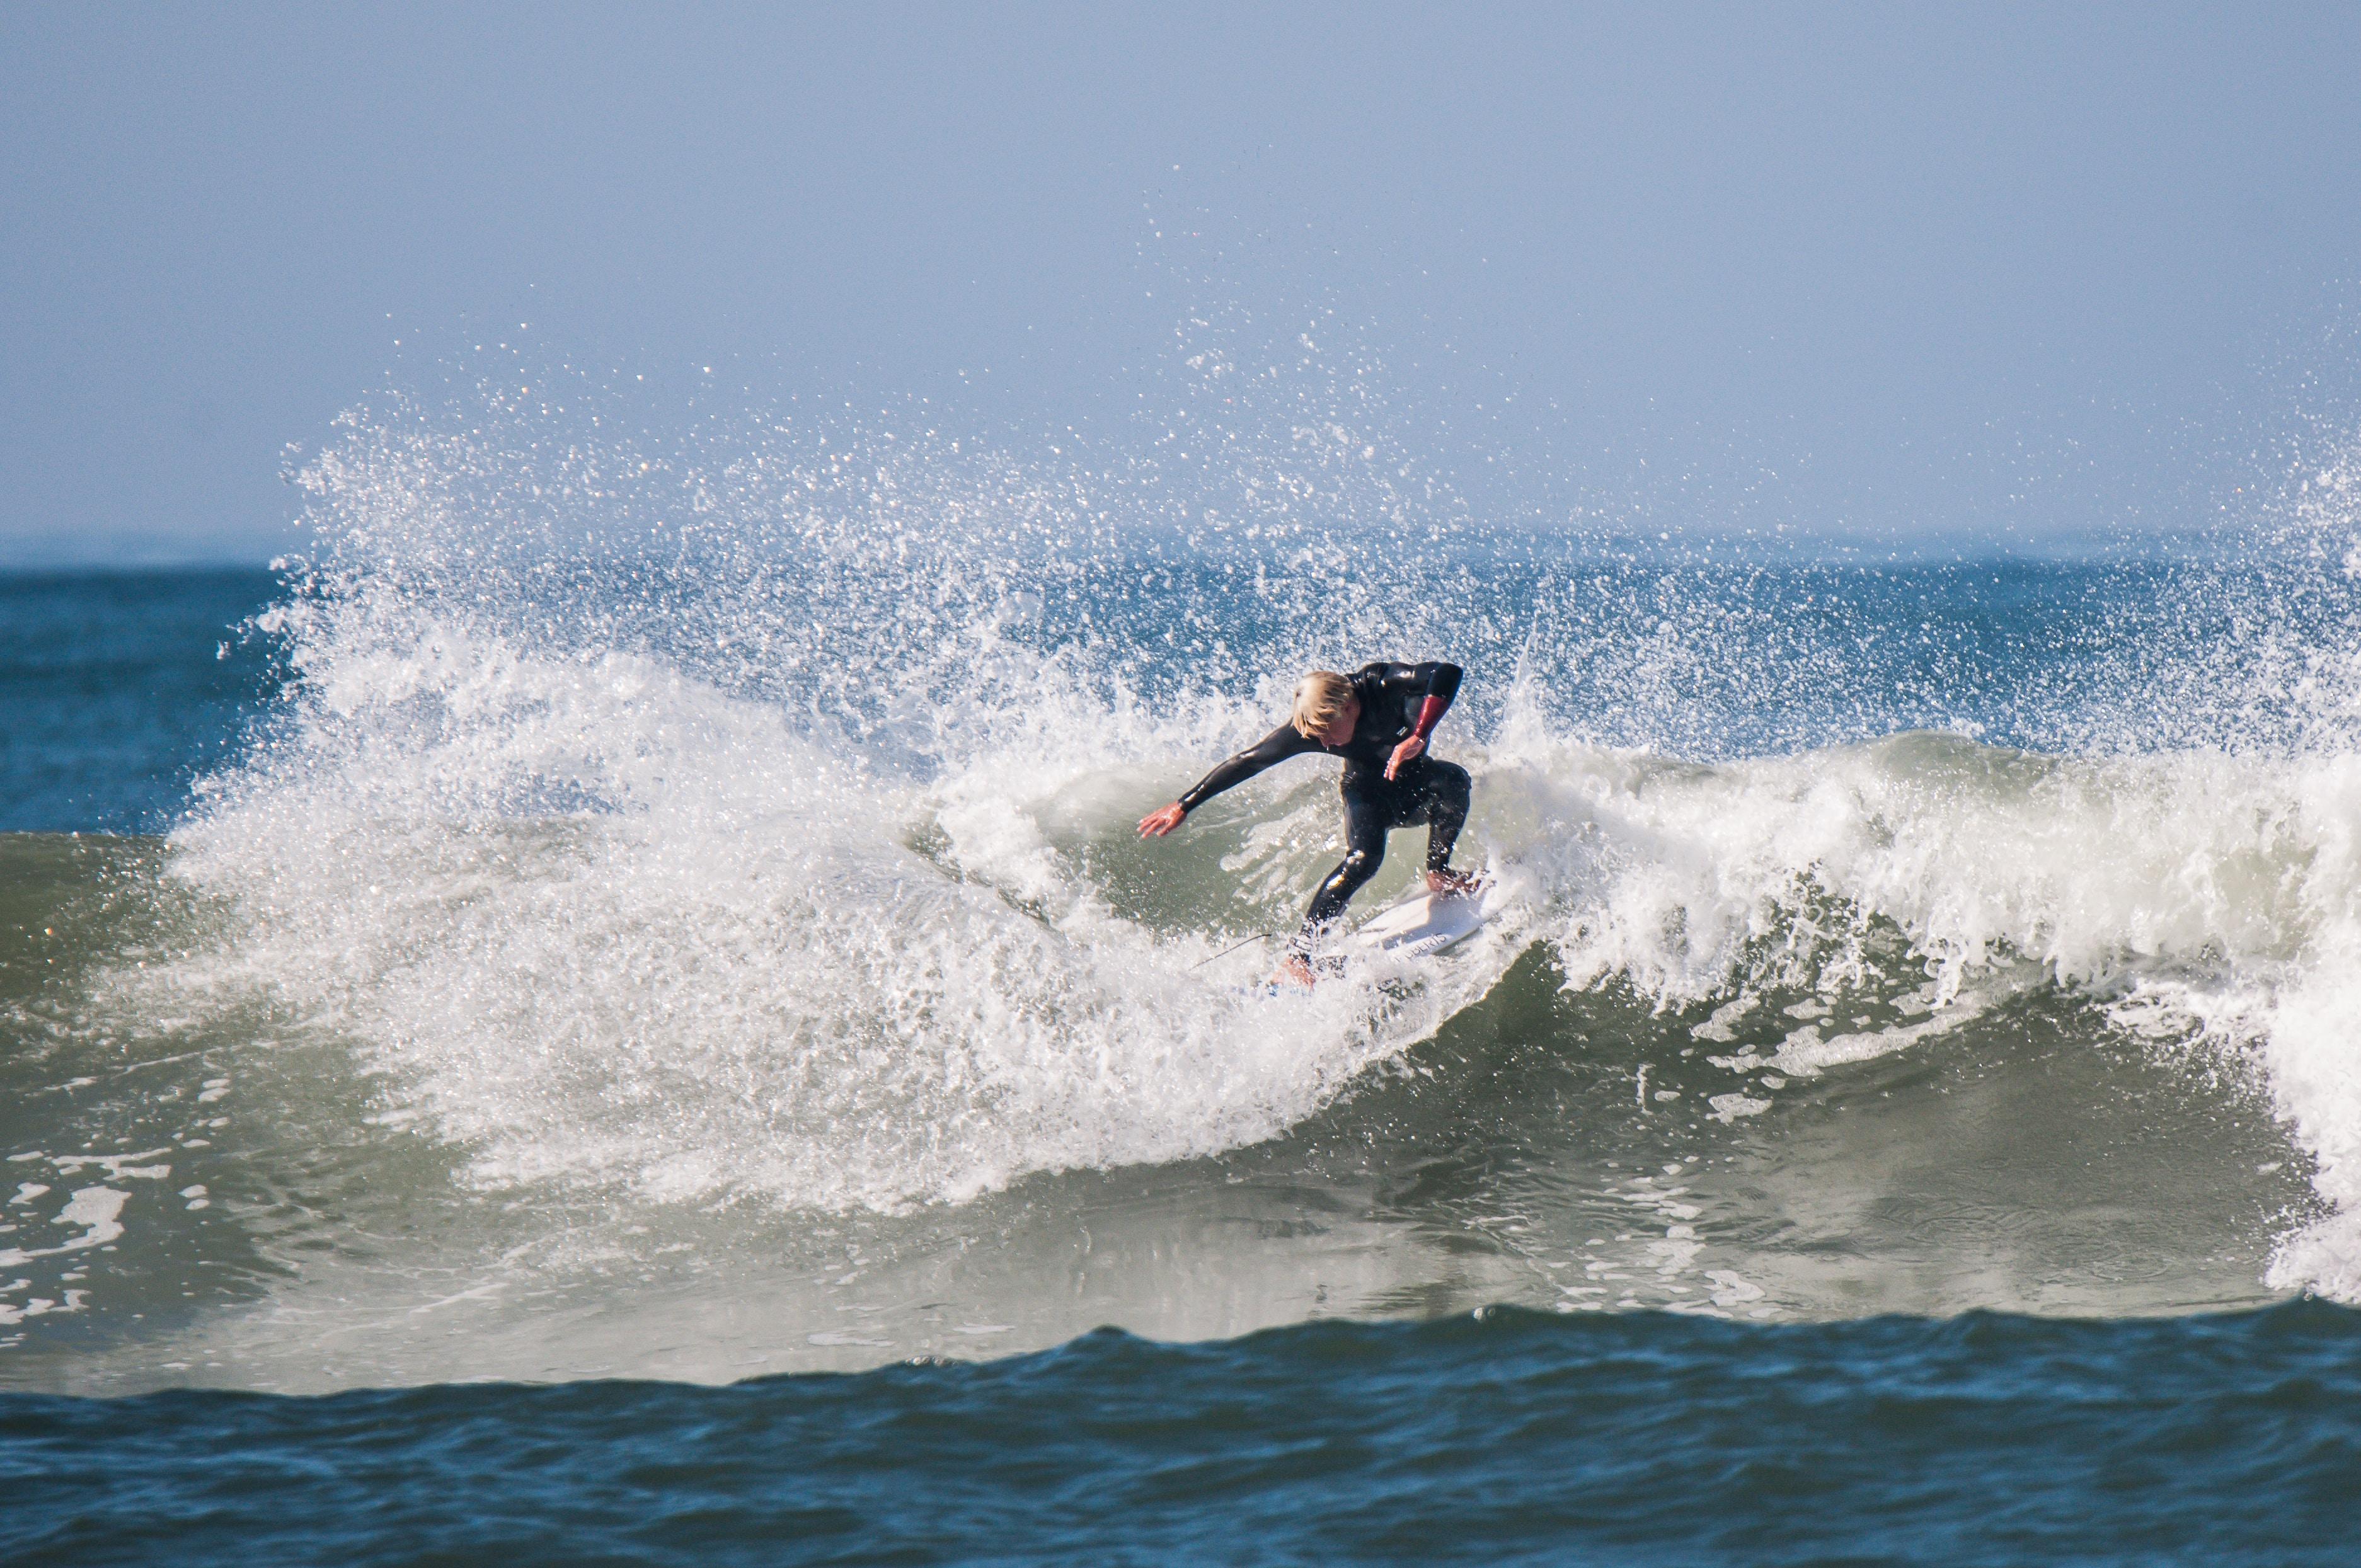 man doing surfboard